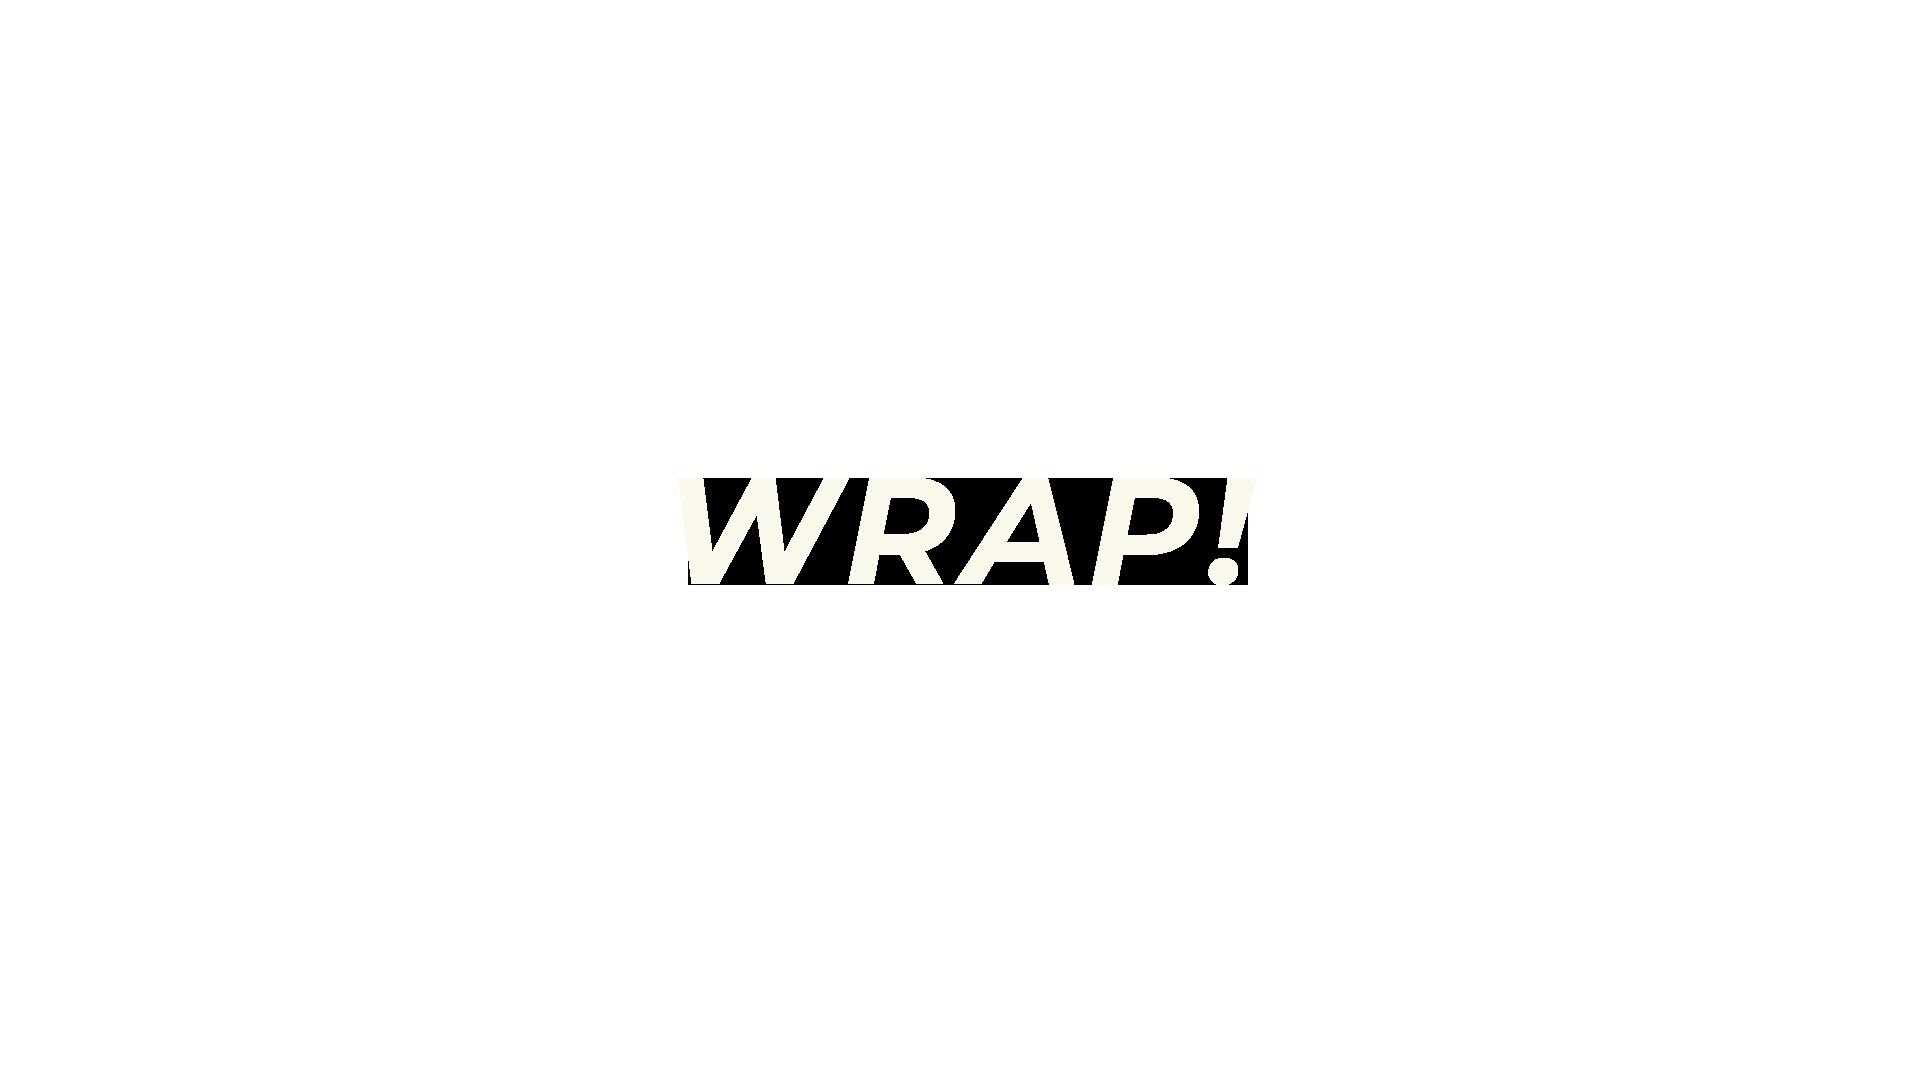 Wrap!